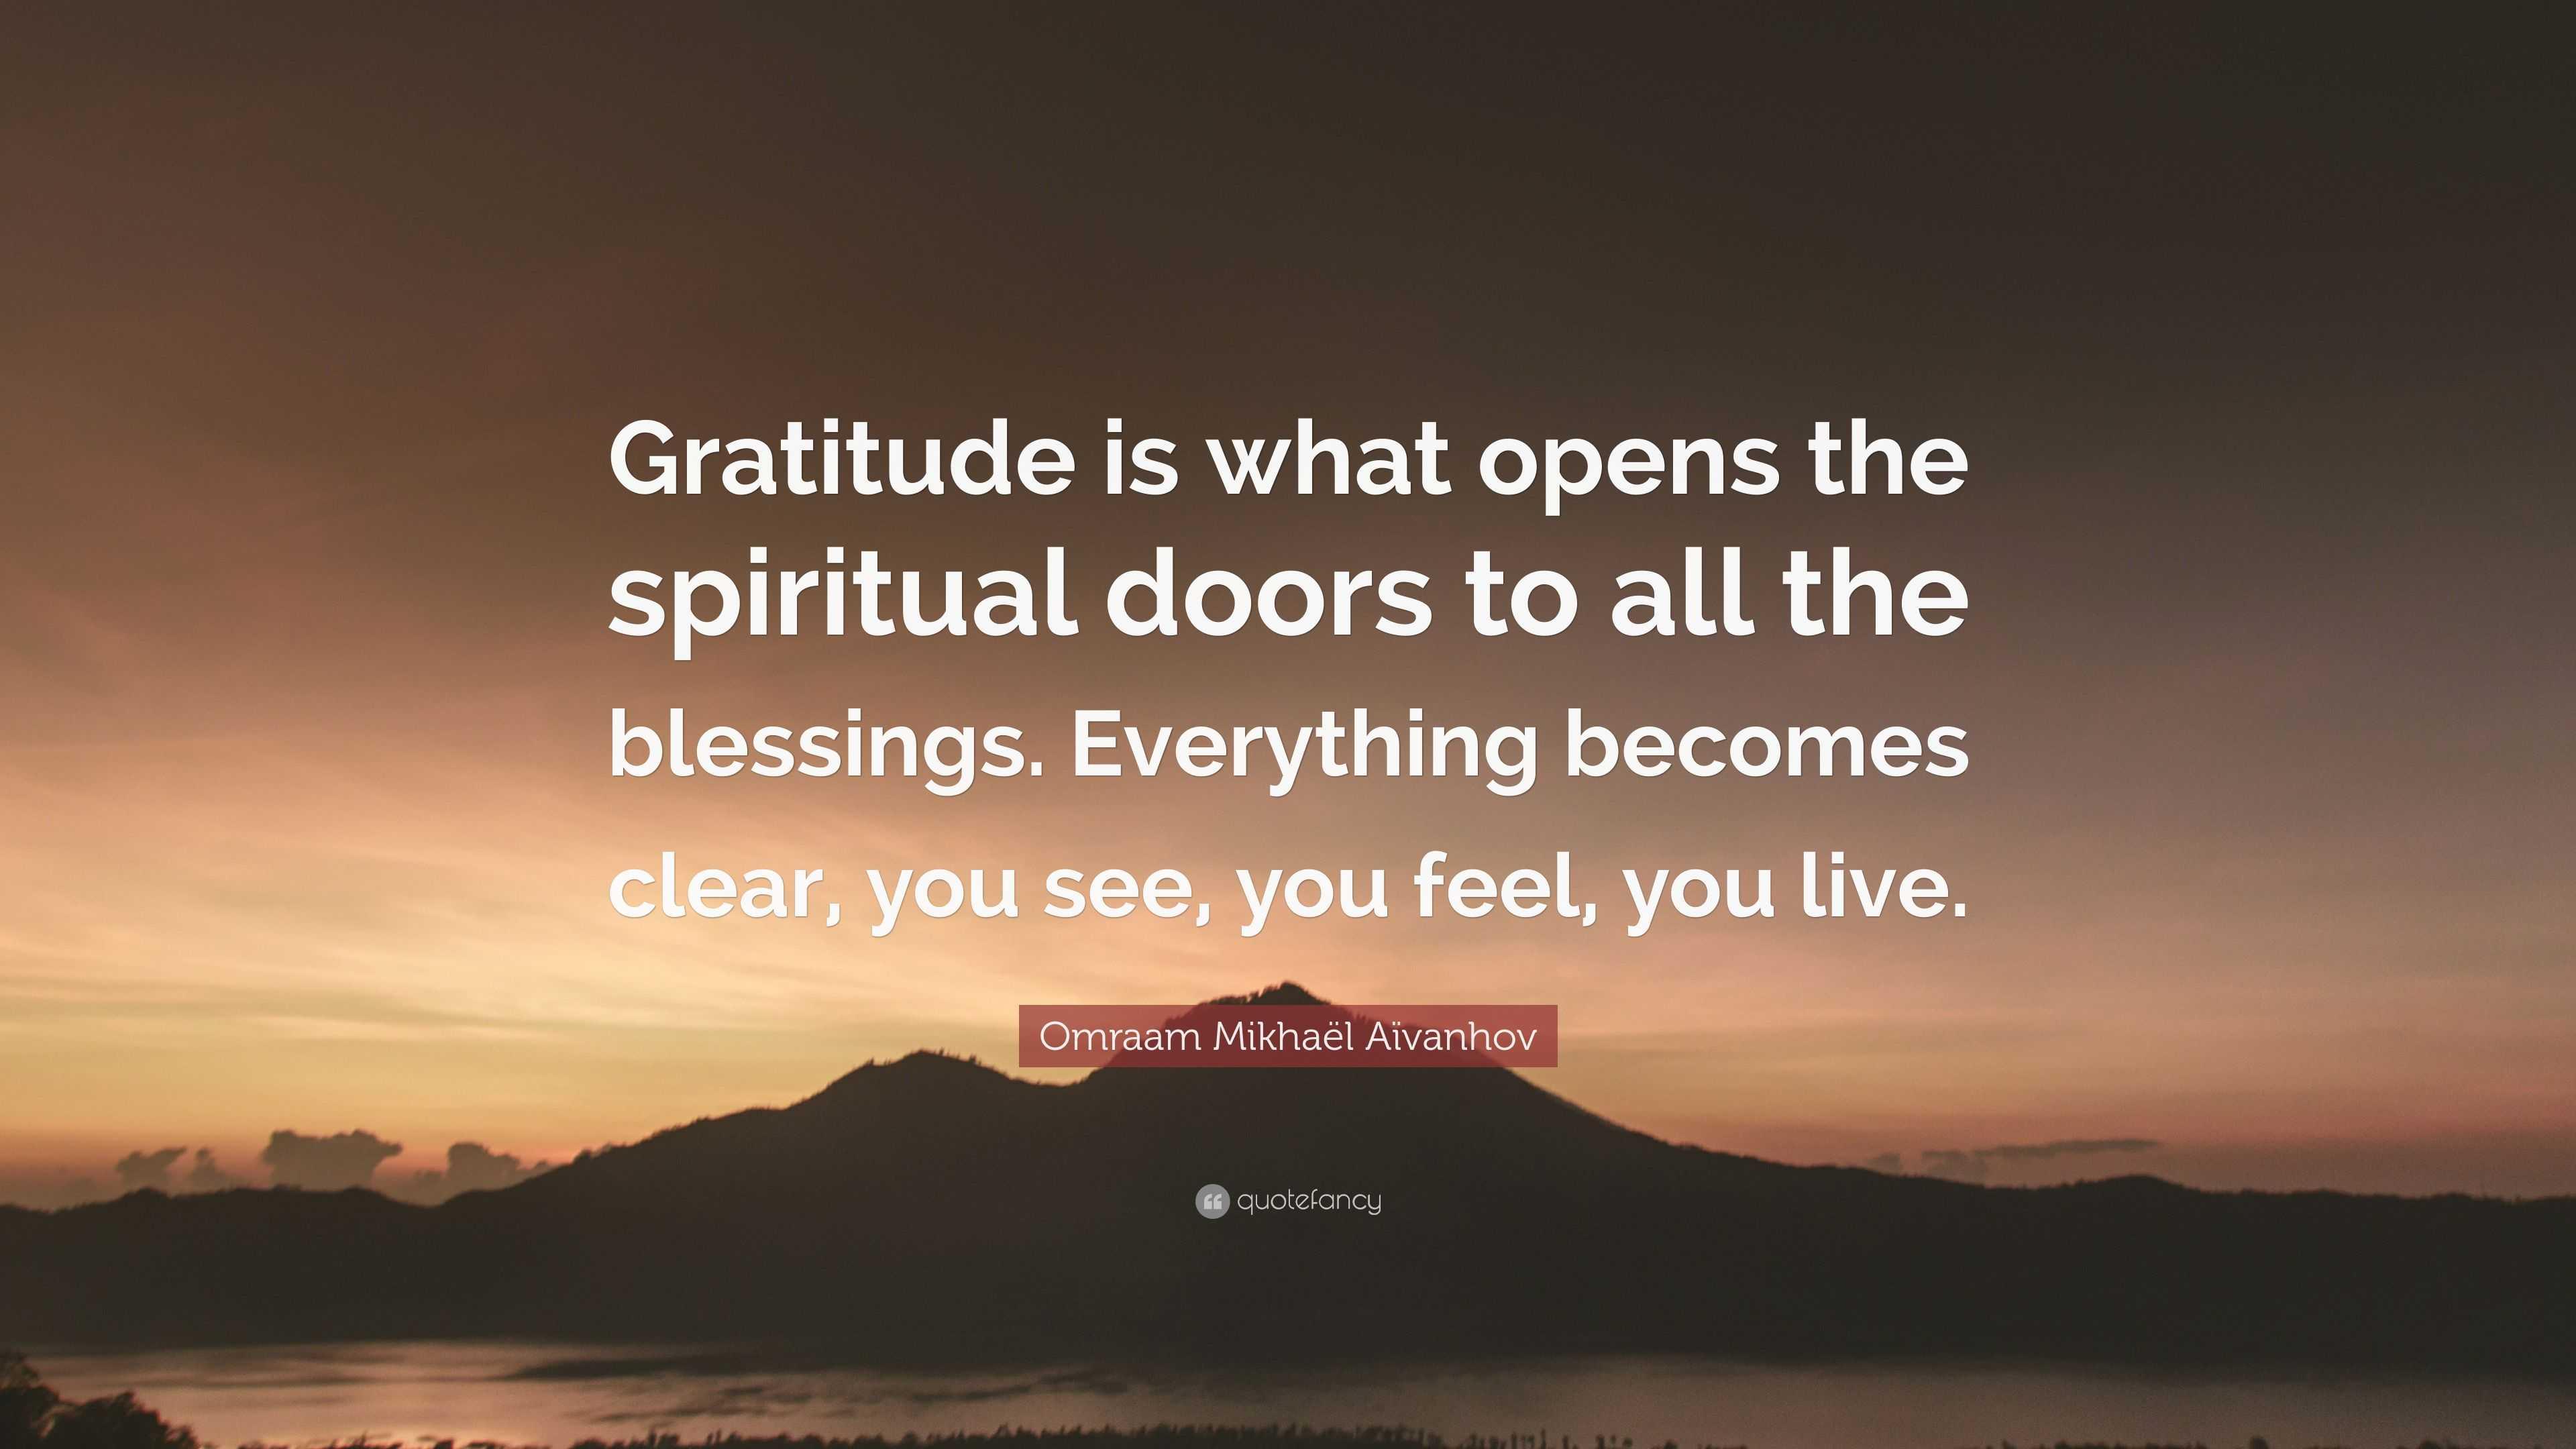 Omraam Mikhaël Aïvanhov Quote \u201cGratitude is what opens the spiritual doors to all the & Omraam Mikhaël Aïvanhov Quote: \u201cGratitude is what opens the ...